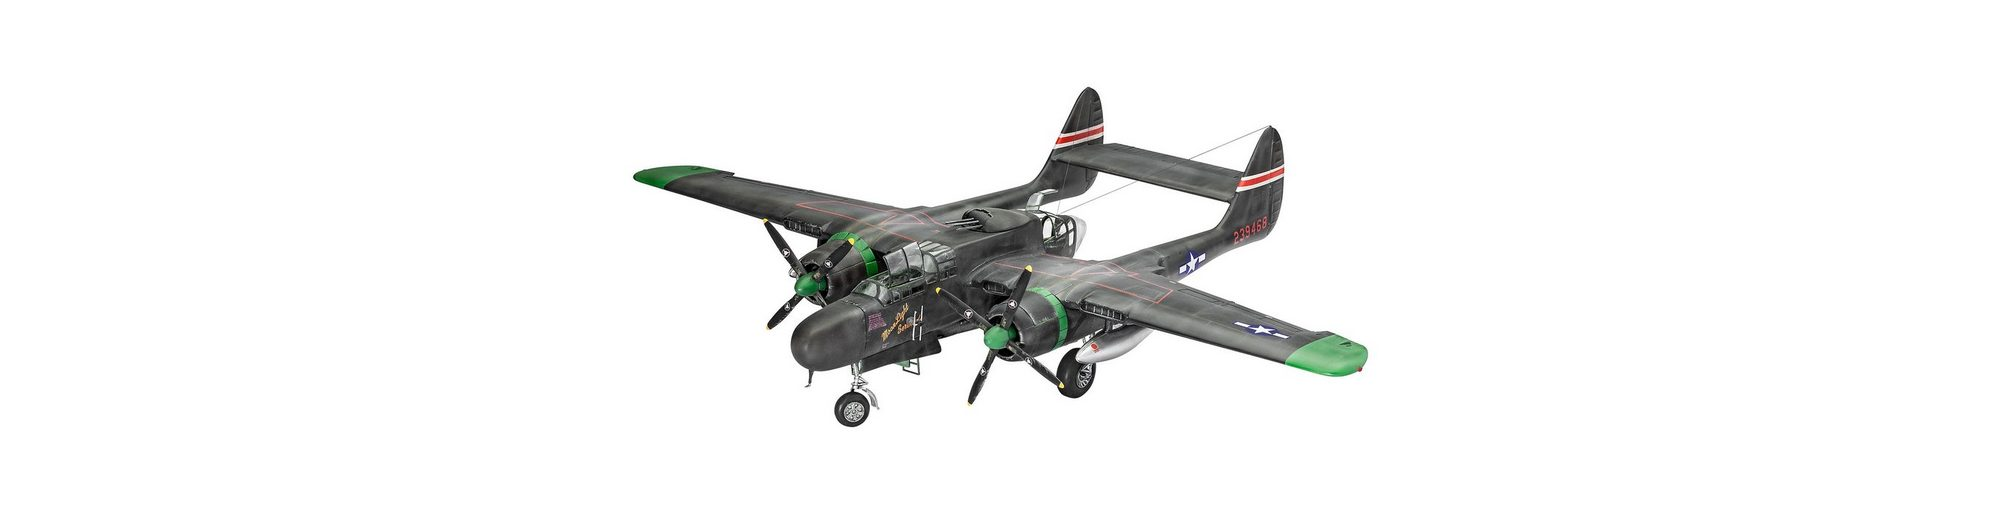 Revell® Modellbausatz Flugzeug, »Northrop P-61A/B Black Widow«, 1:48